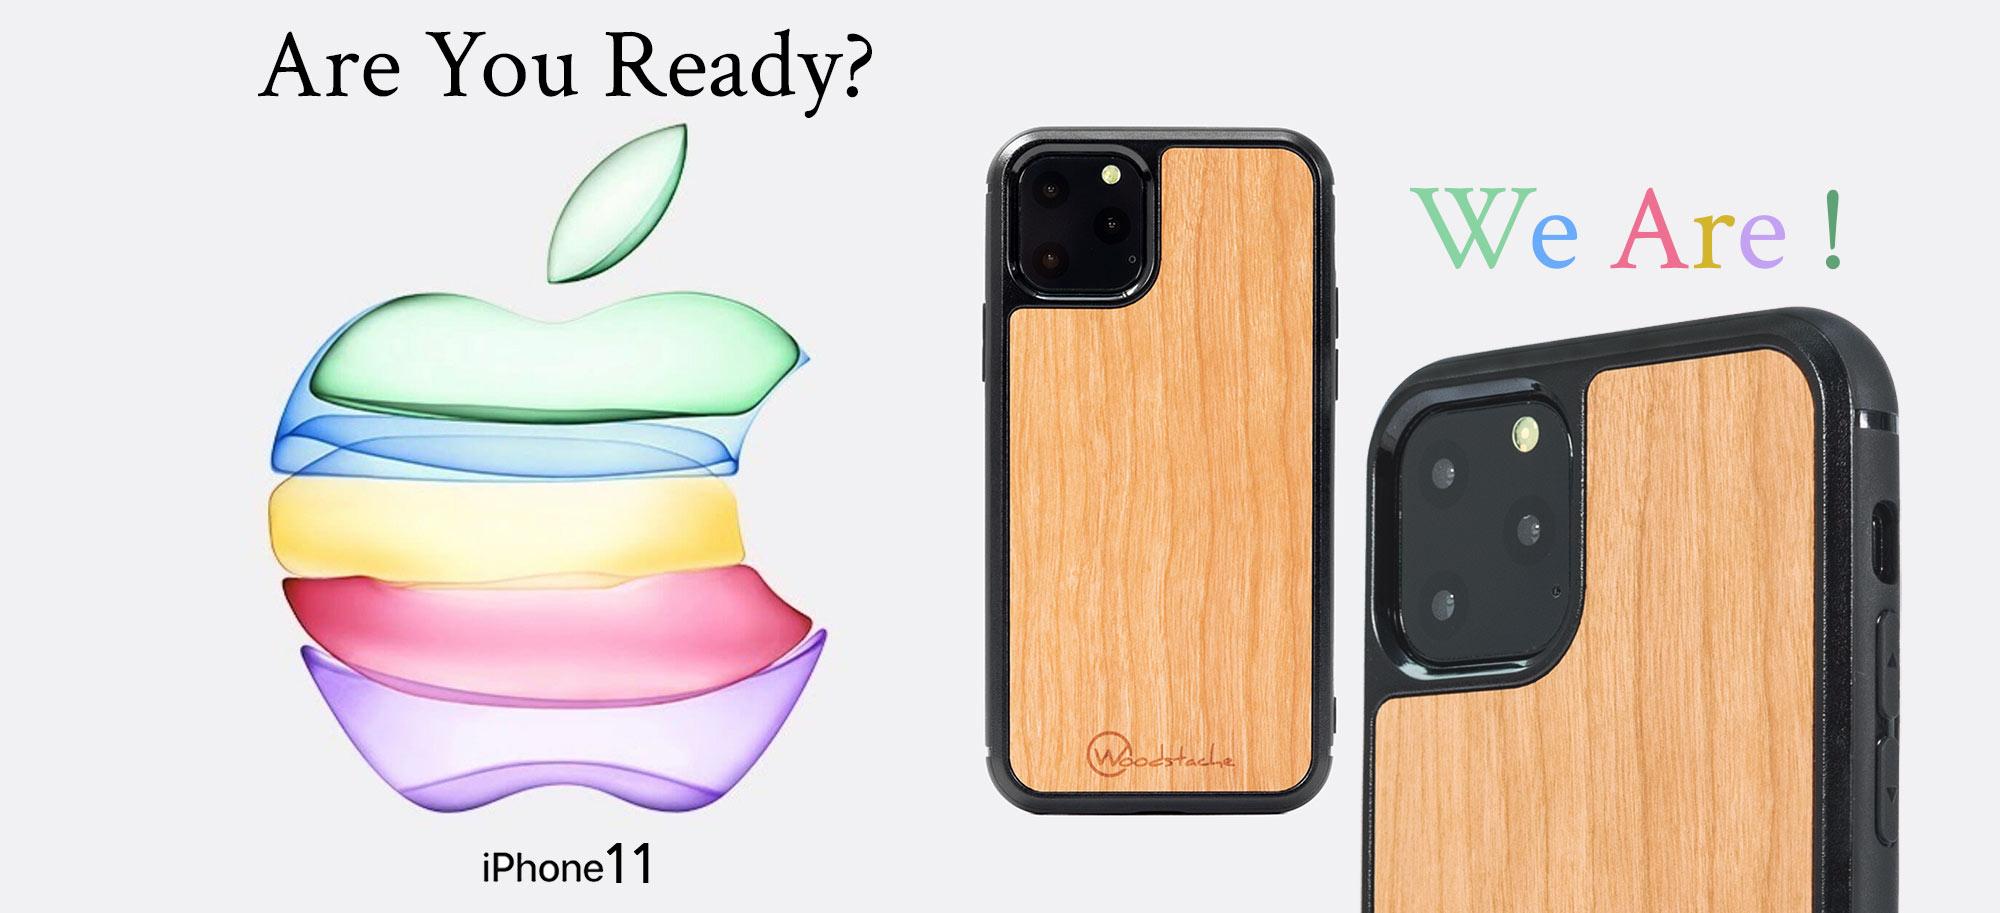 iPhone 11 coque en bois